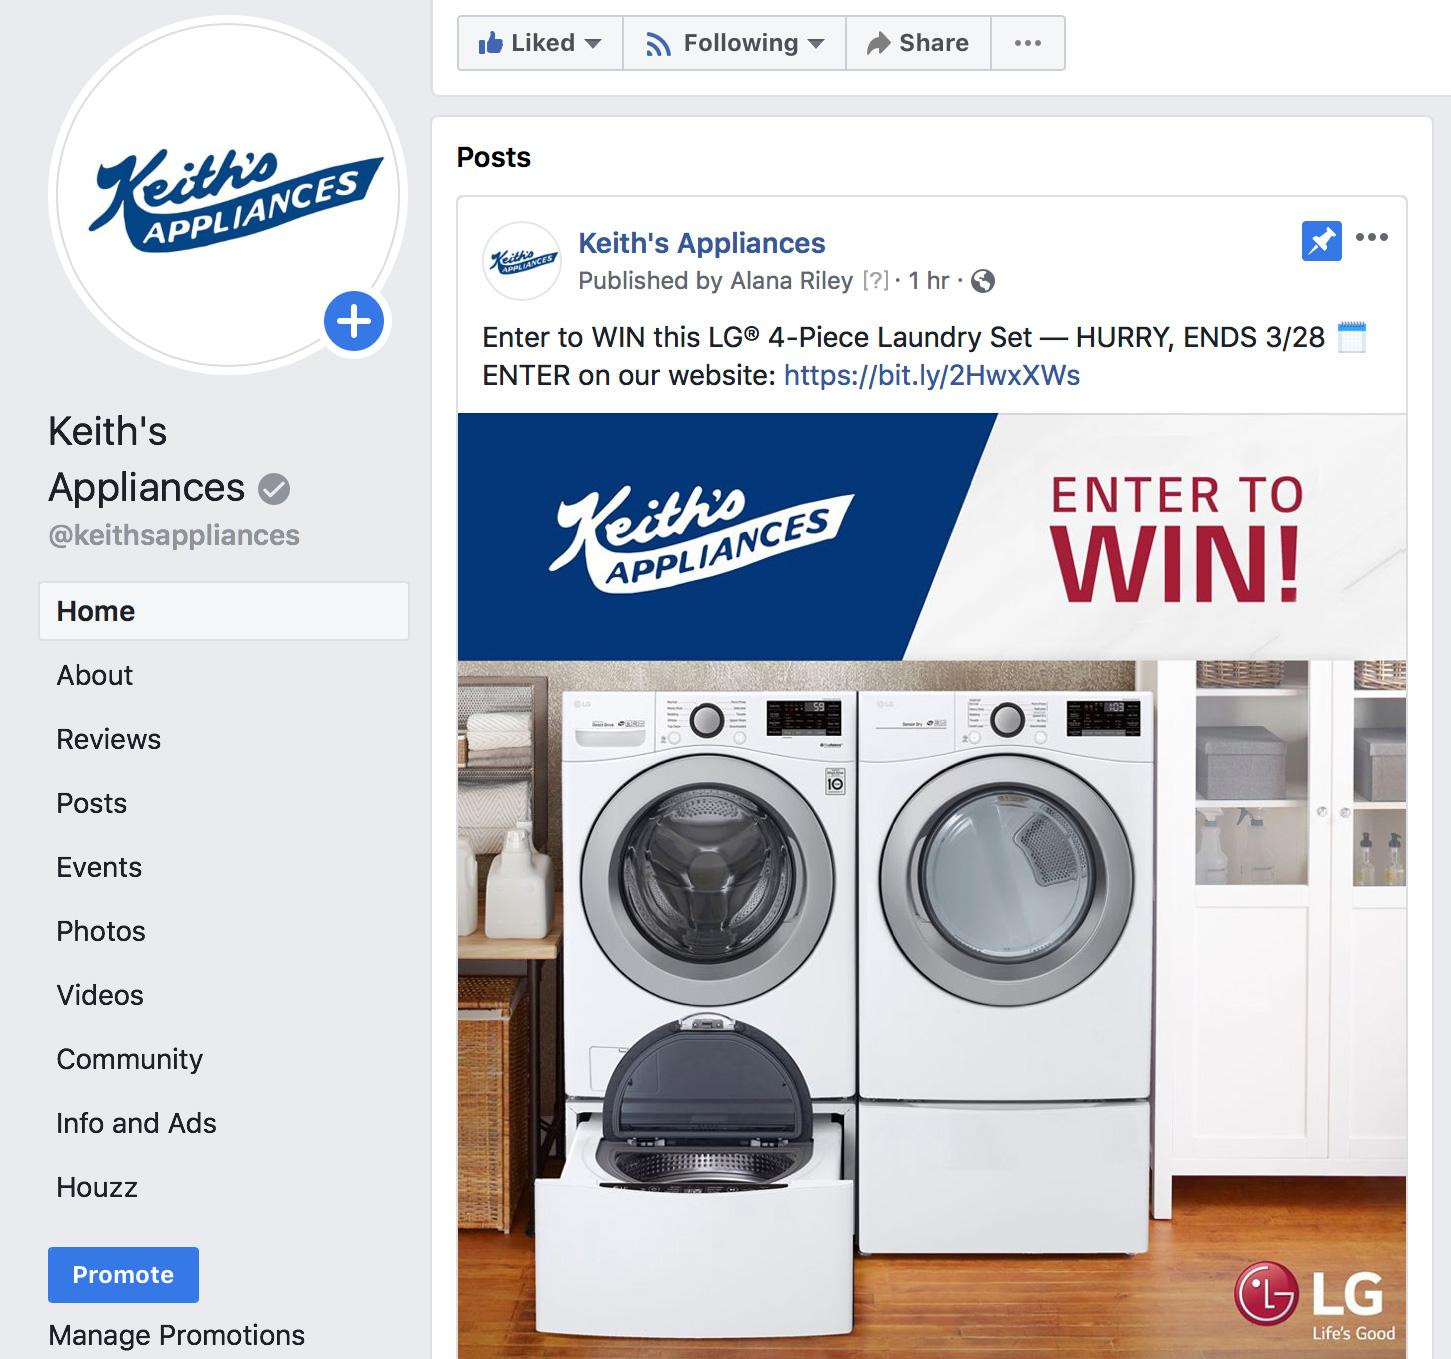 keiths-appliances.jpg